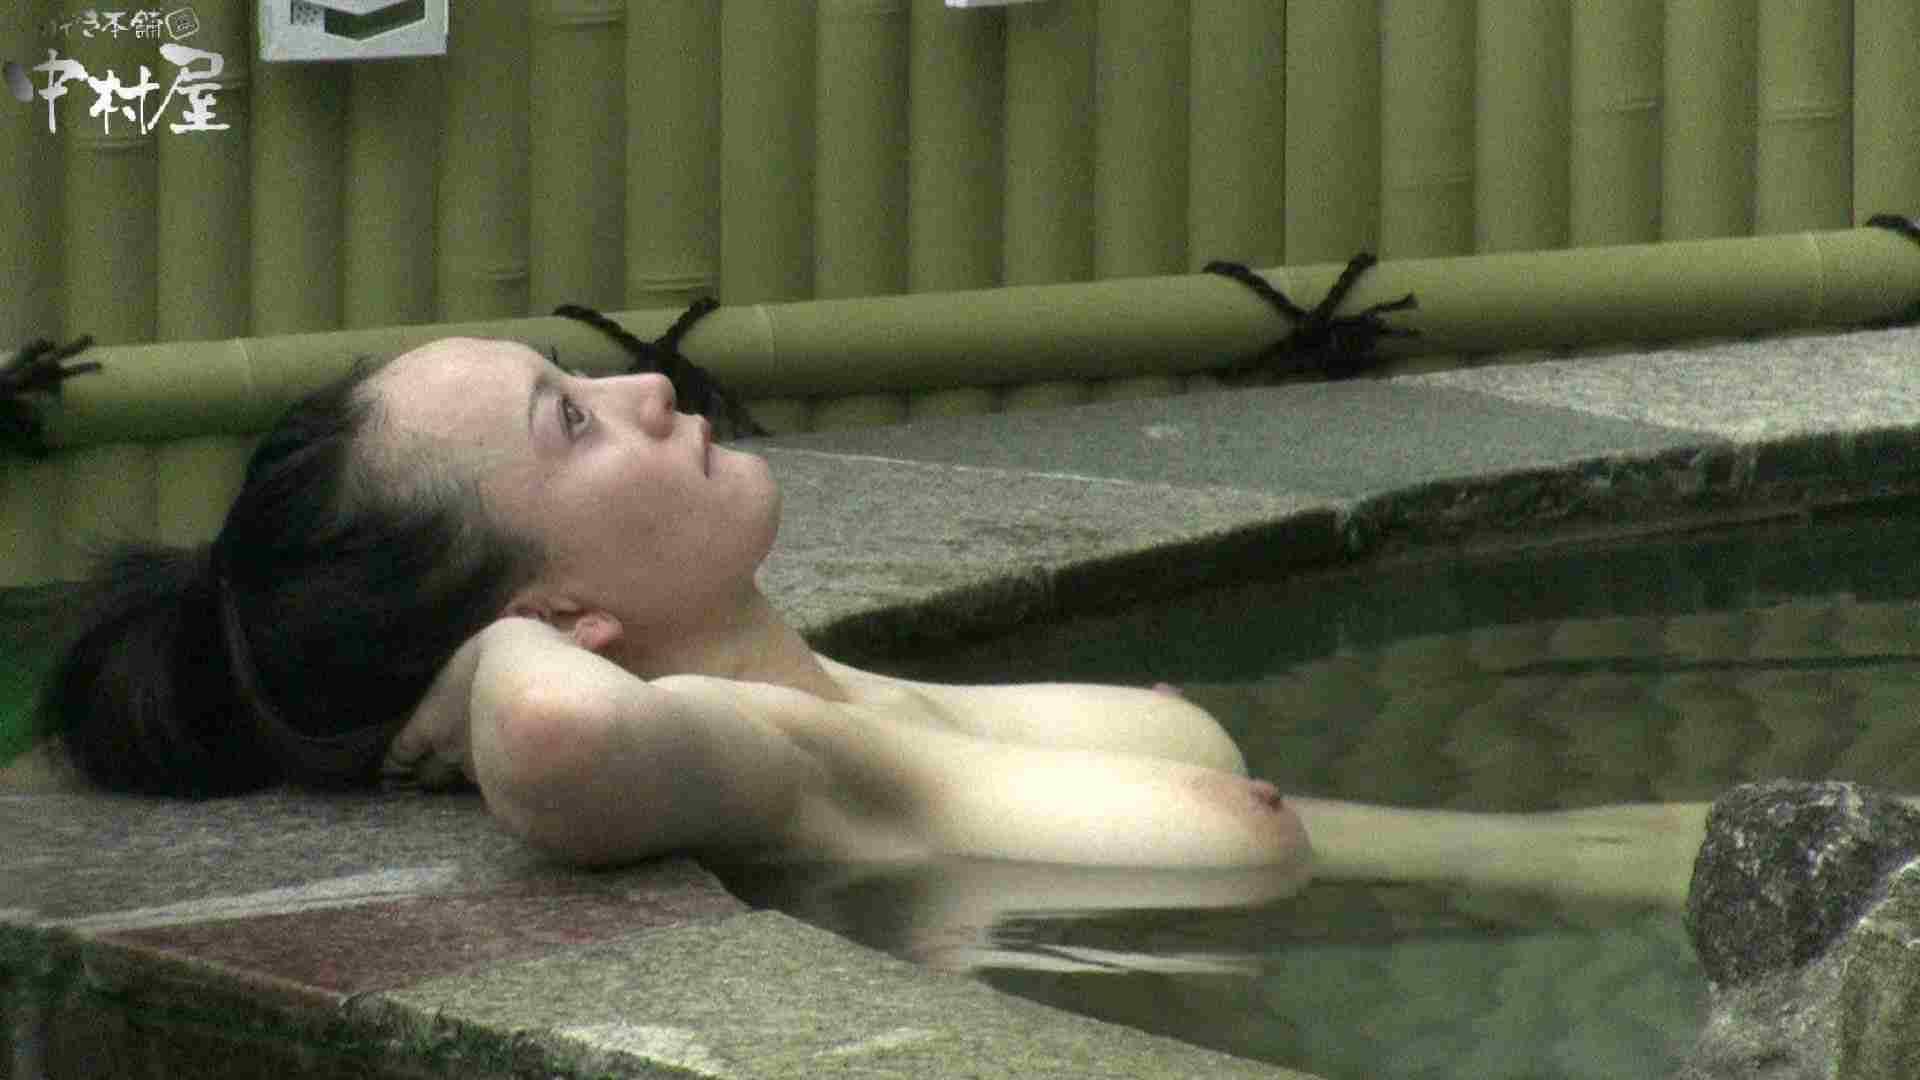 Aquaな露天風呂Vol.900 露天覗き のぞき動画キャプチャ 71枚